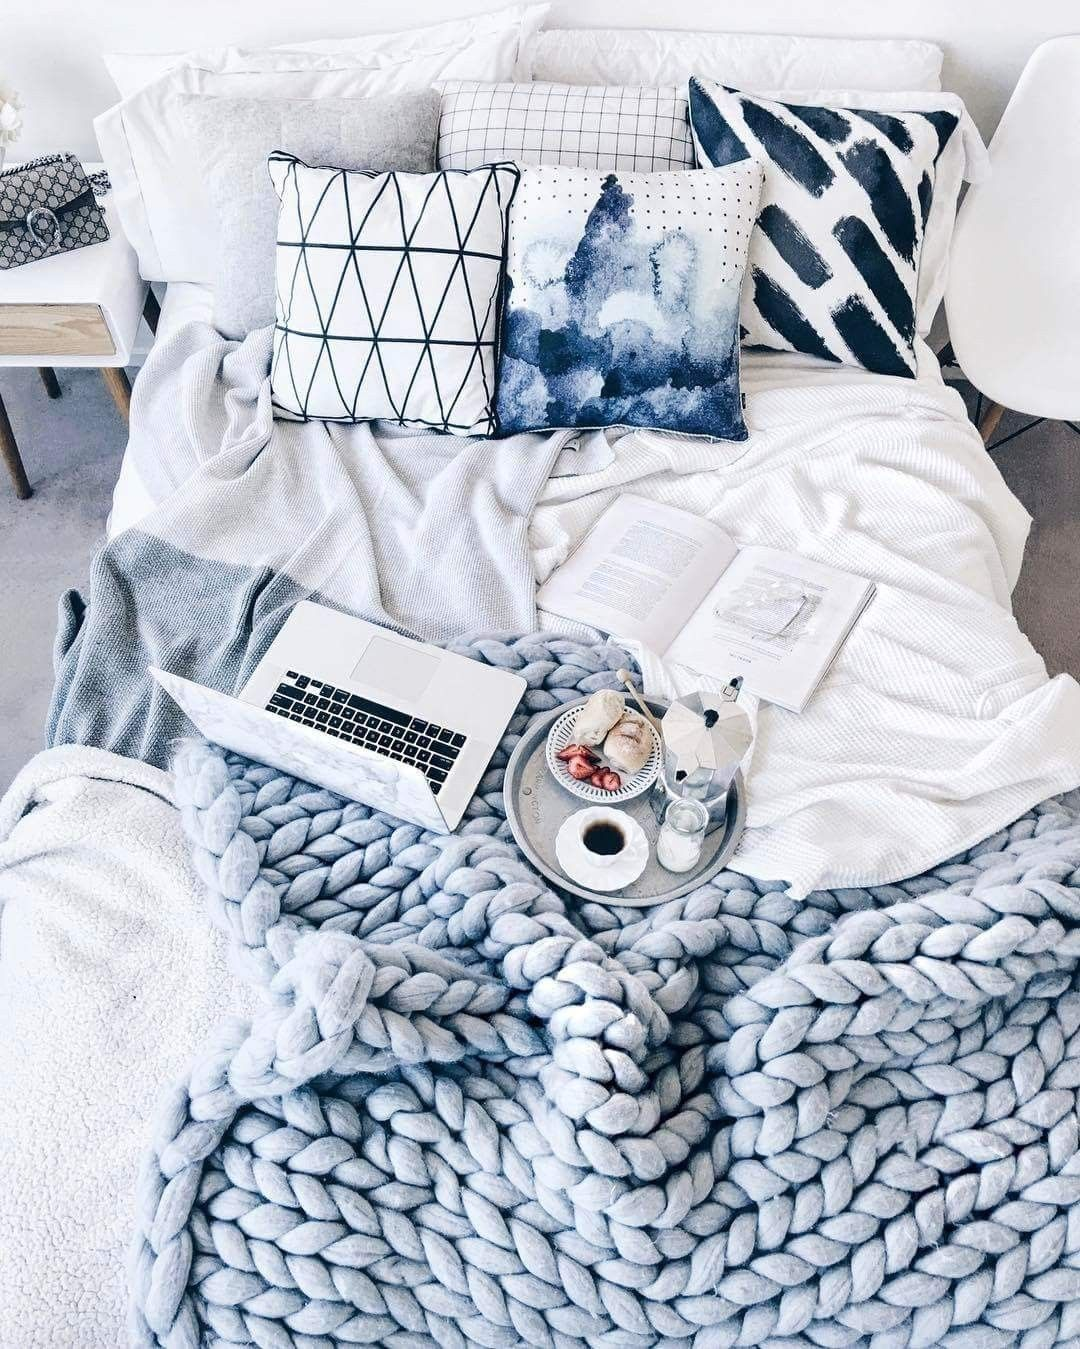 cute bed sheets tumblr. Interiors Cute Bed Sheets Tumblr